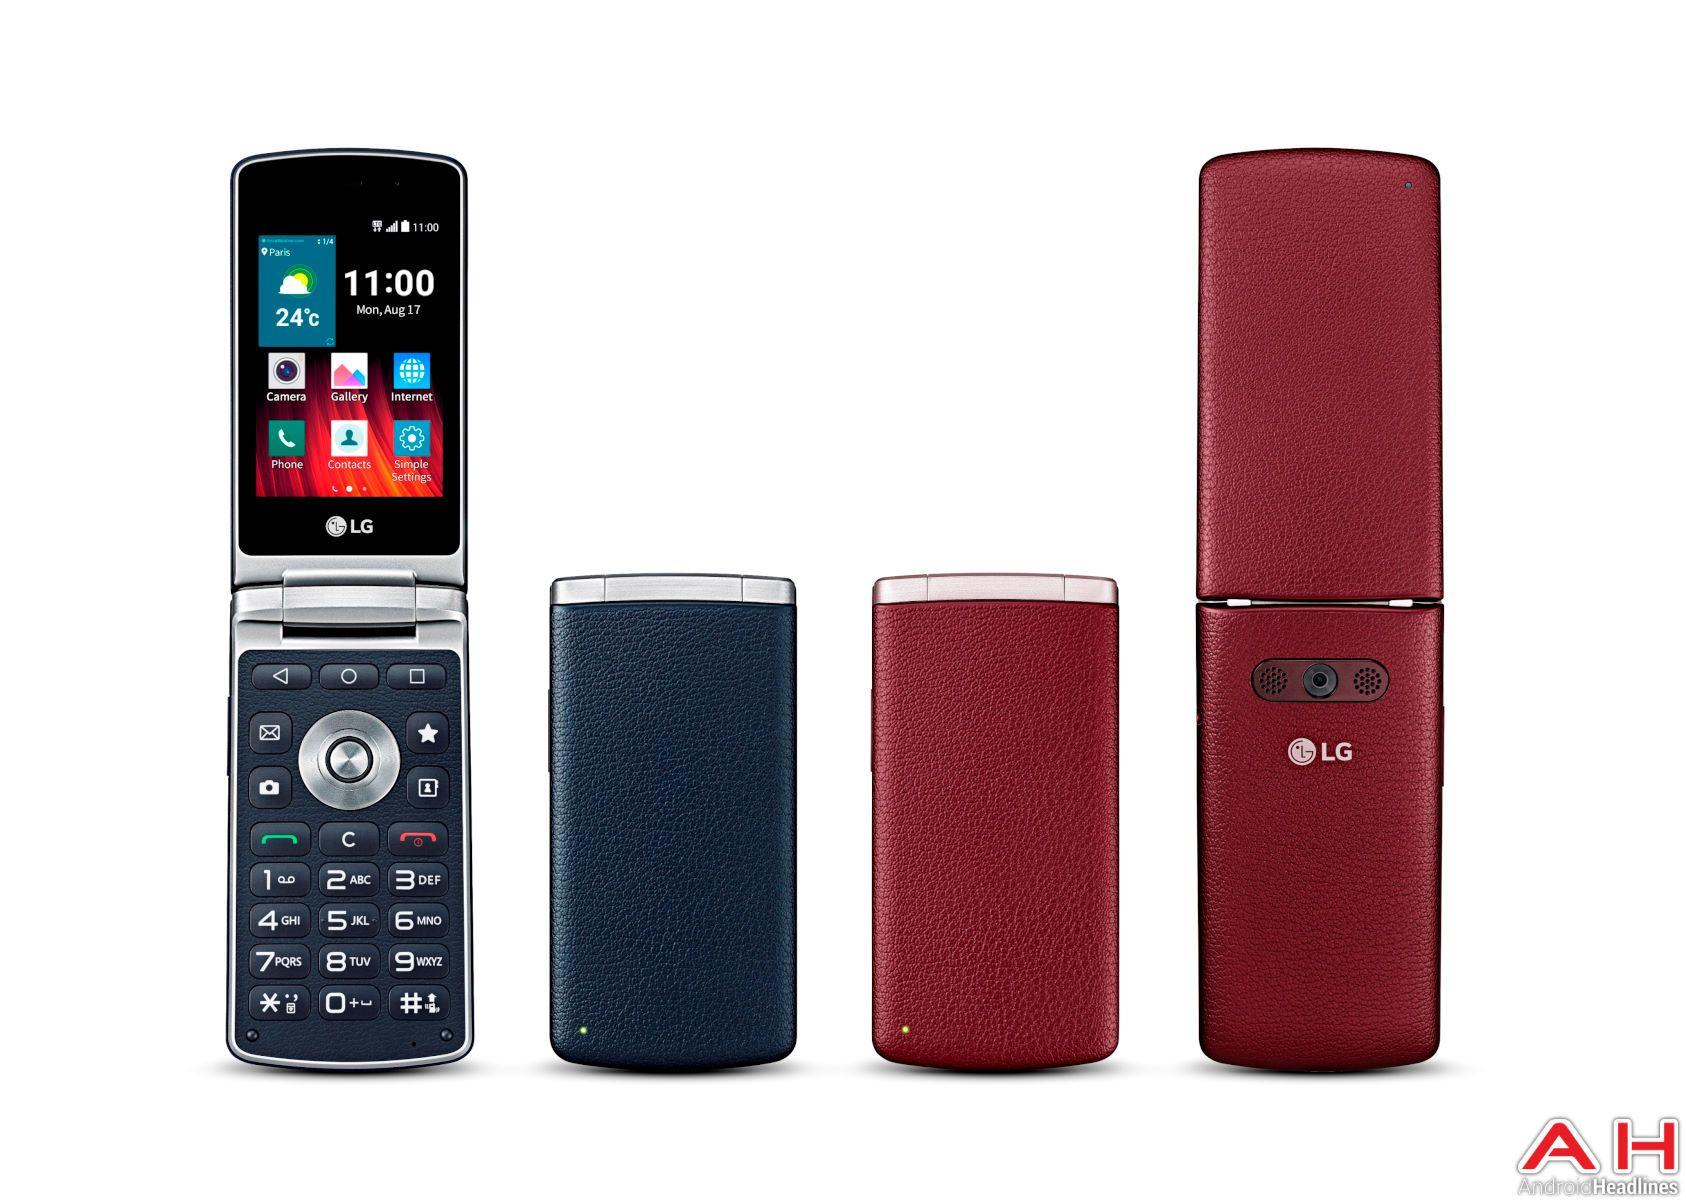 Lg Announce The International Lg Wine Smart Flip Phone Flip Phones Android Flip Phone Smartphone